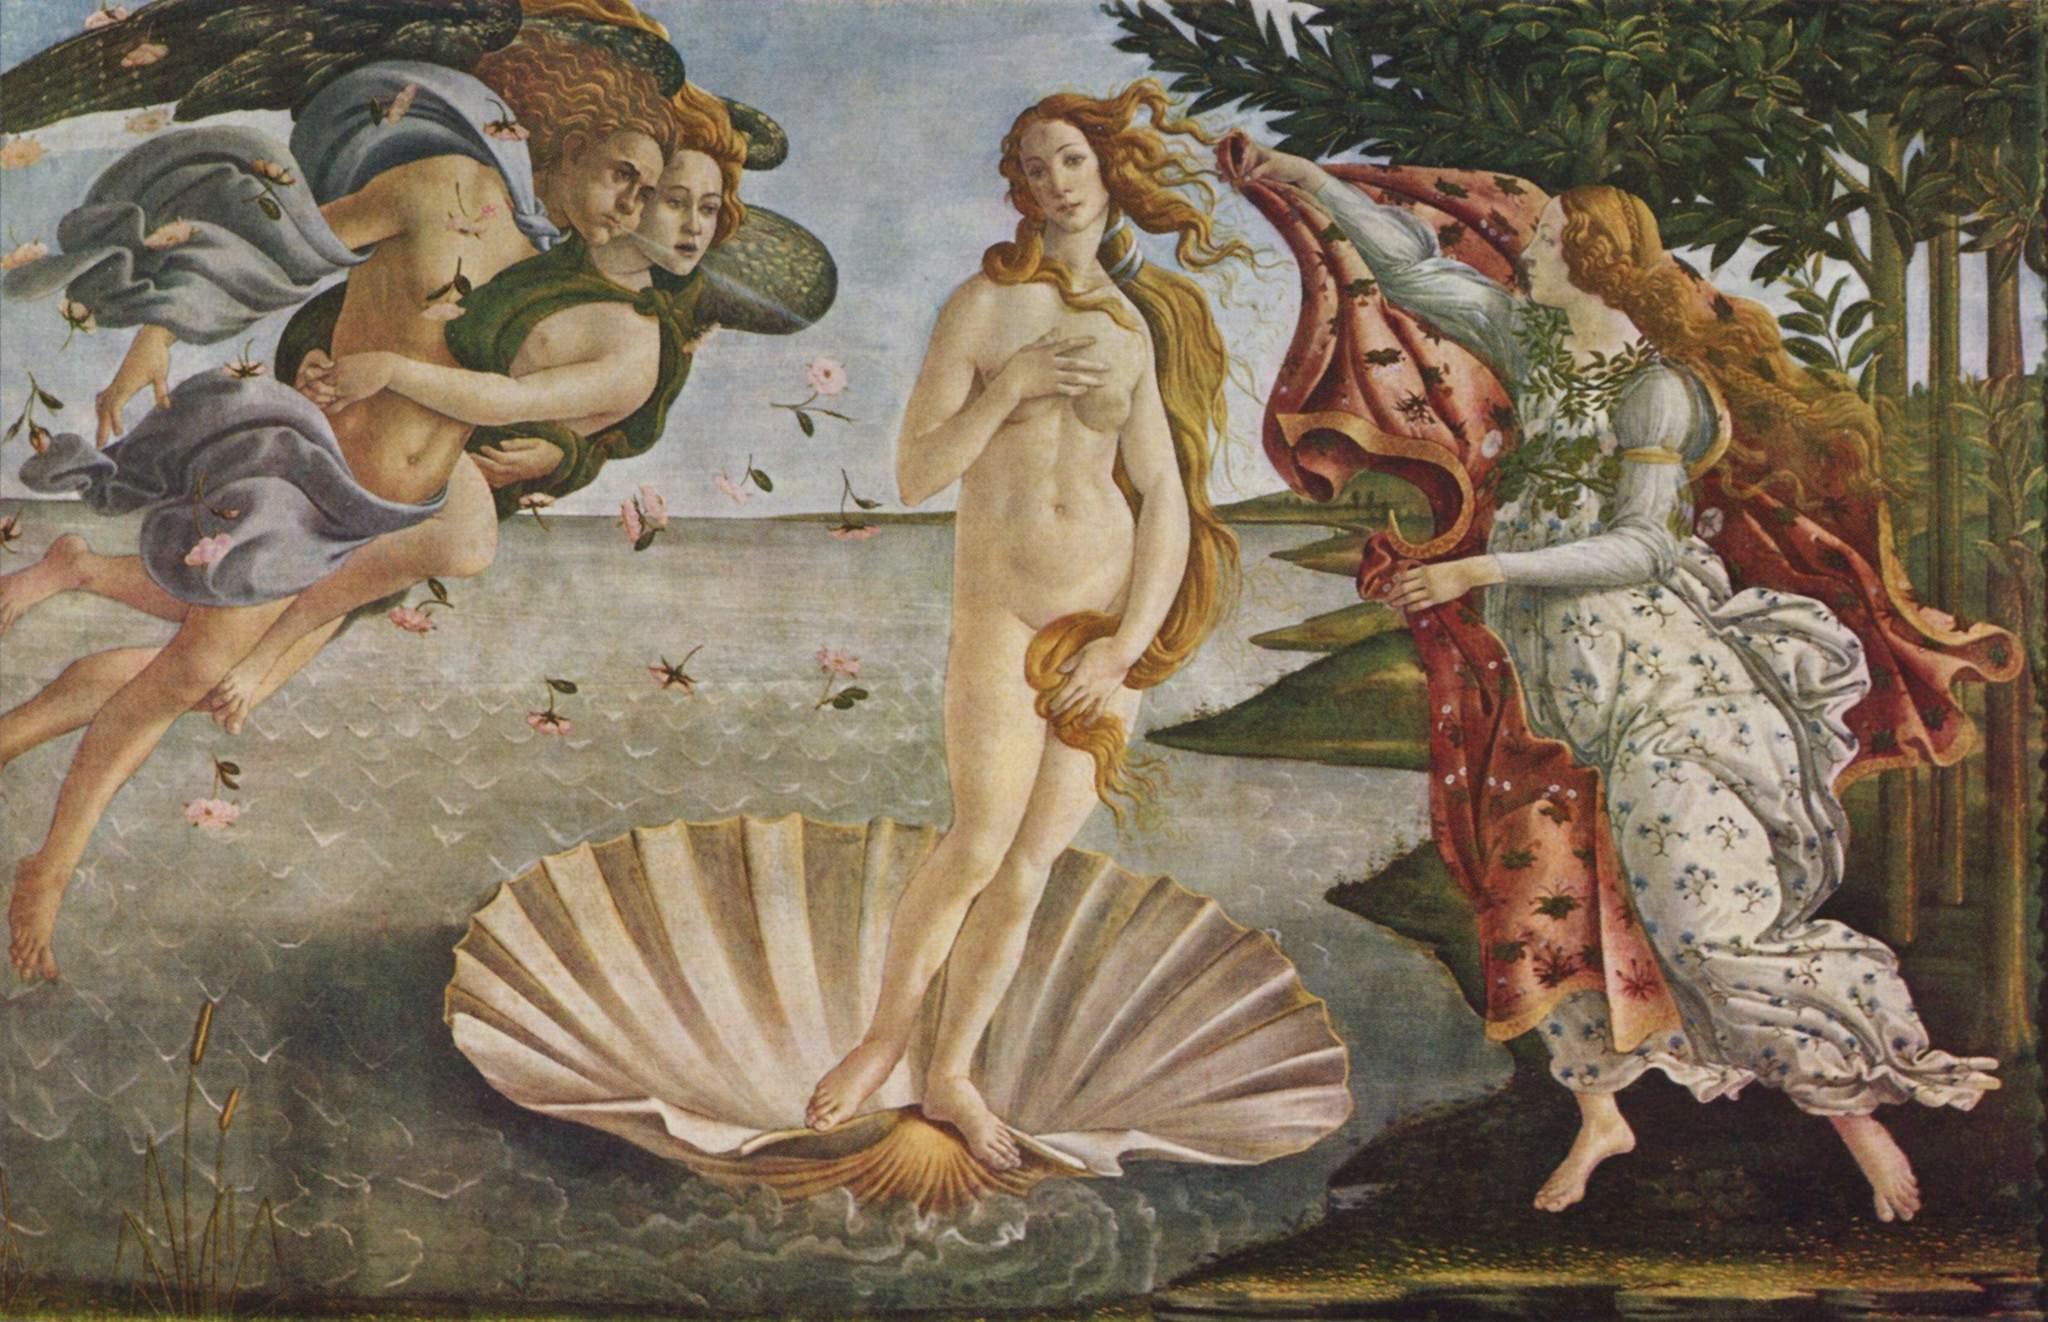 http://upload.wikimedia.org/wikipedia/commons/f/f2/Sandro_Botticelli_046.jpg